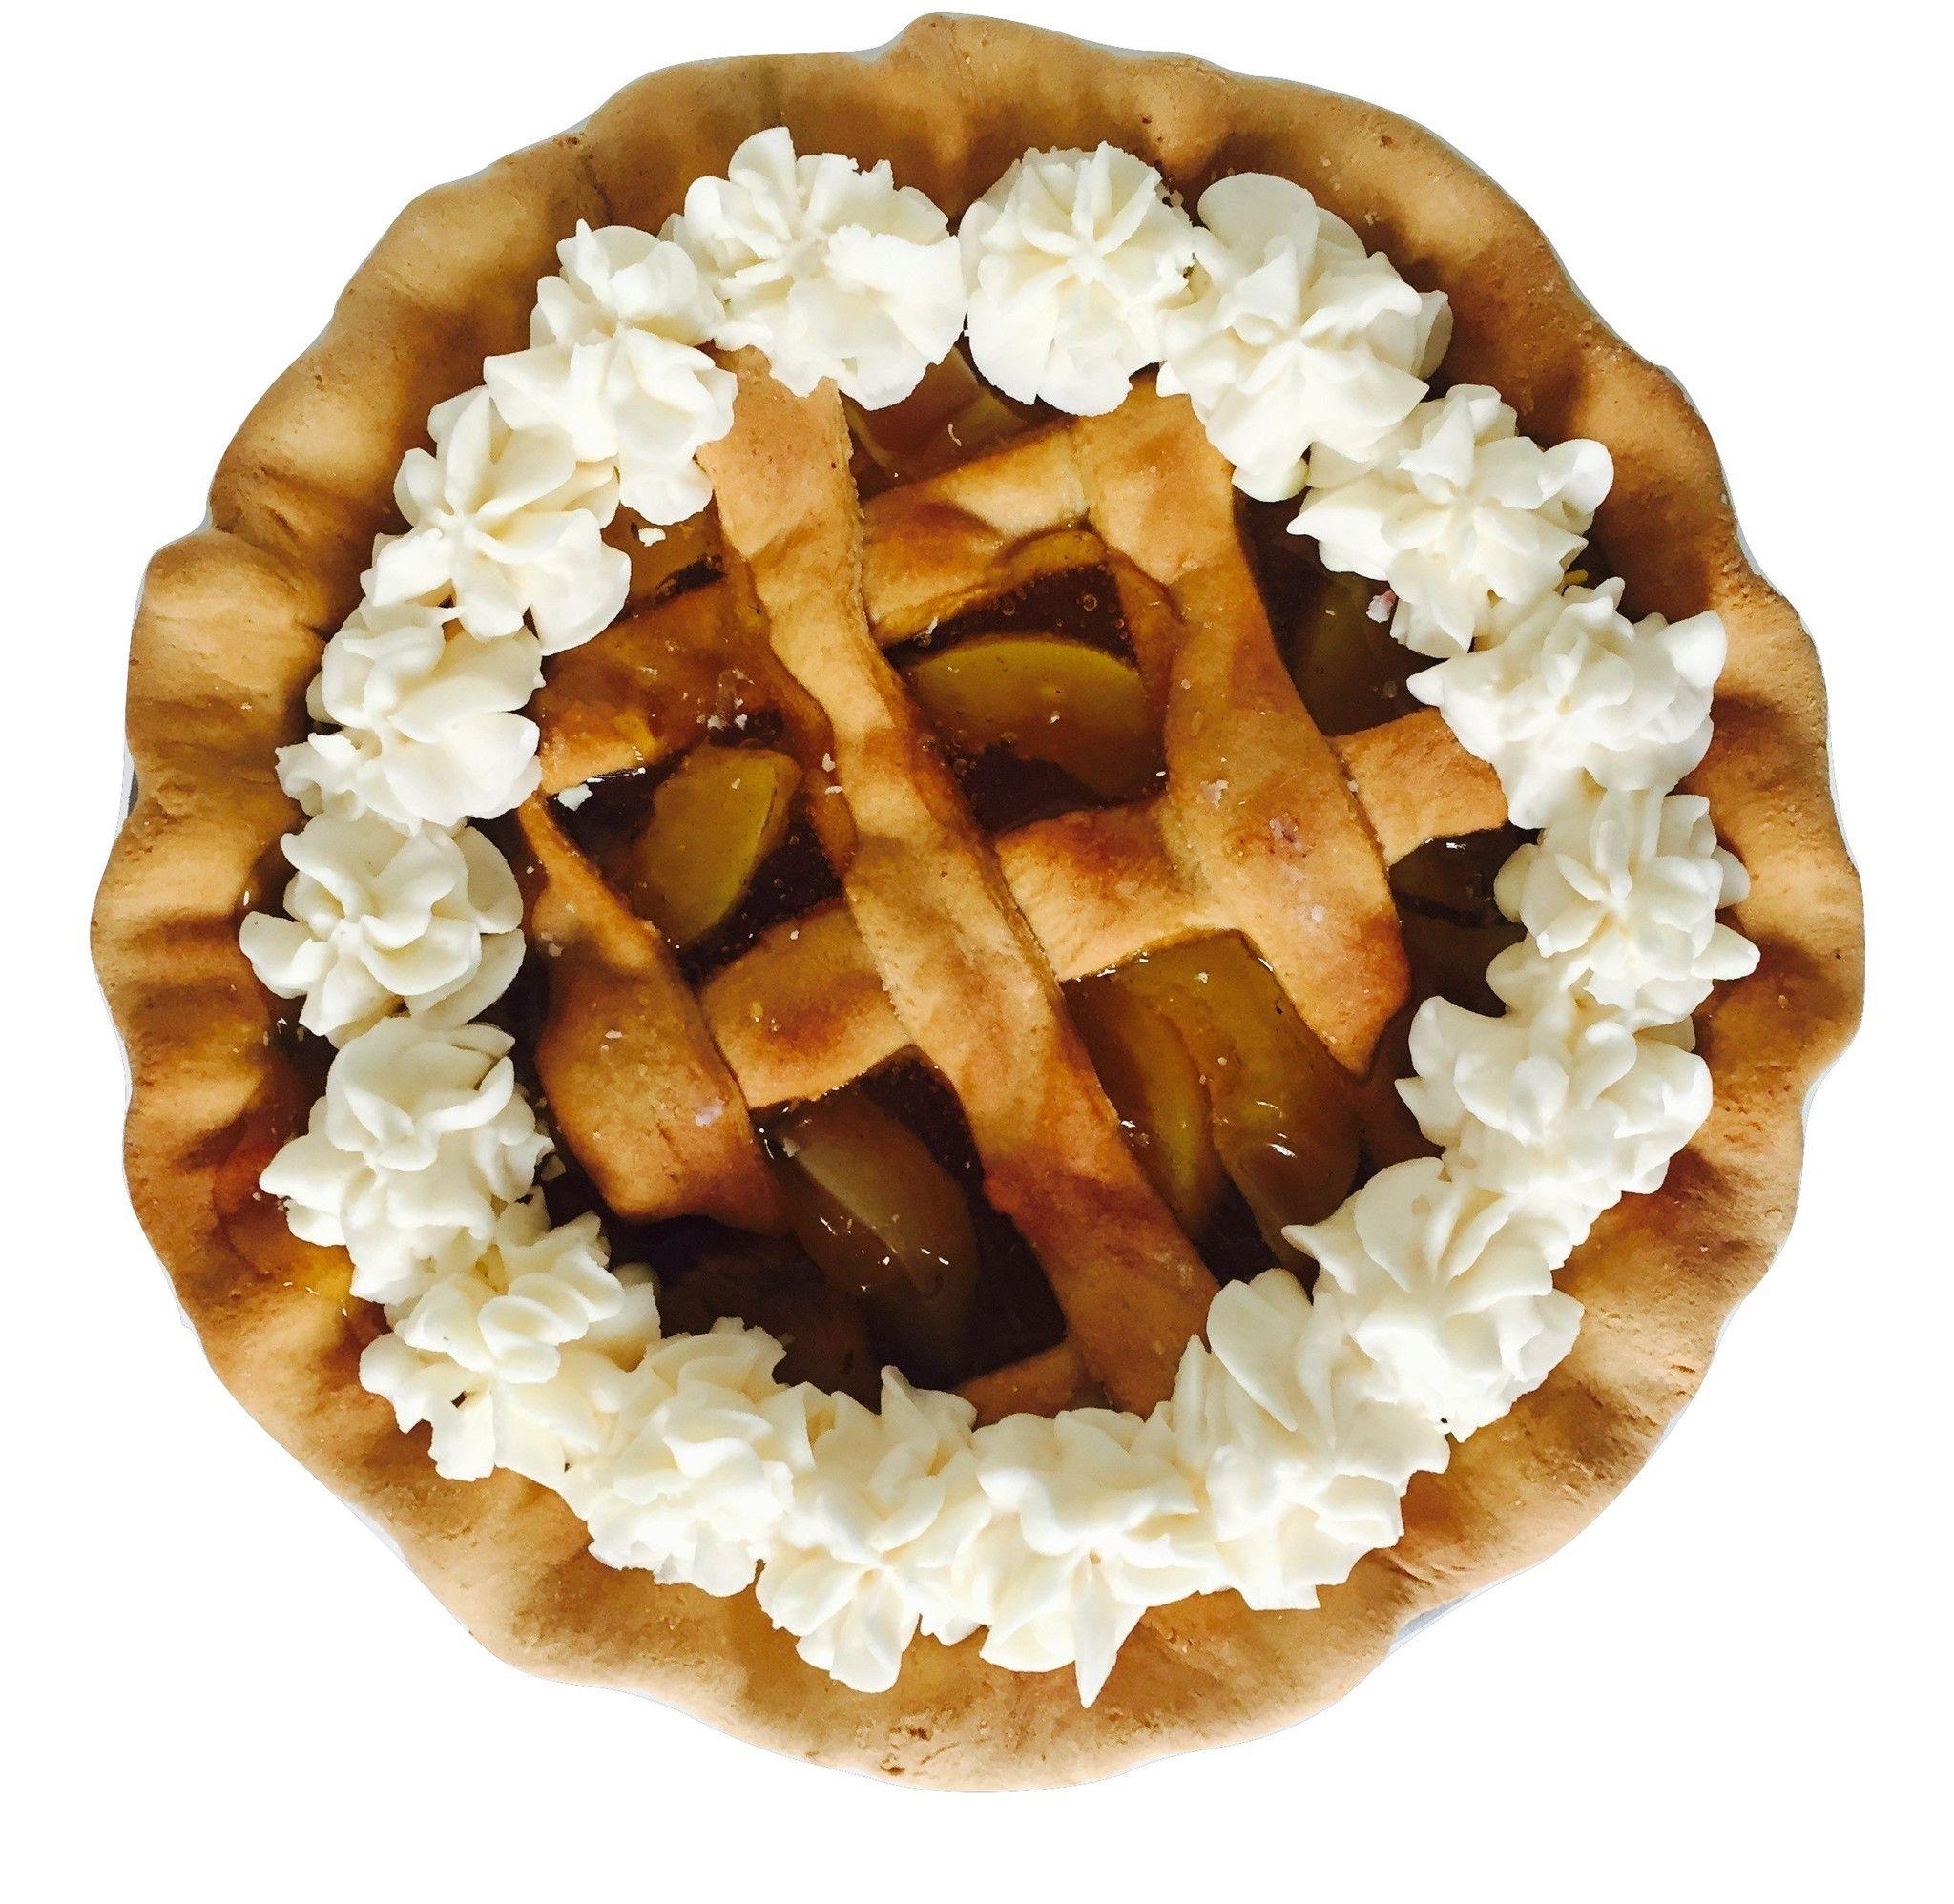 Fake Georgia Peach Pie With Lattice Crust (Scented) by www.EverythingDawnBakeryCandles.com #fakepie #fakepieprop #fakecakesandpies